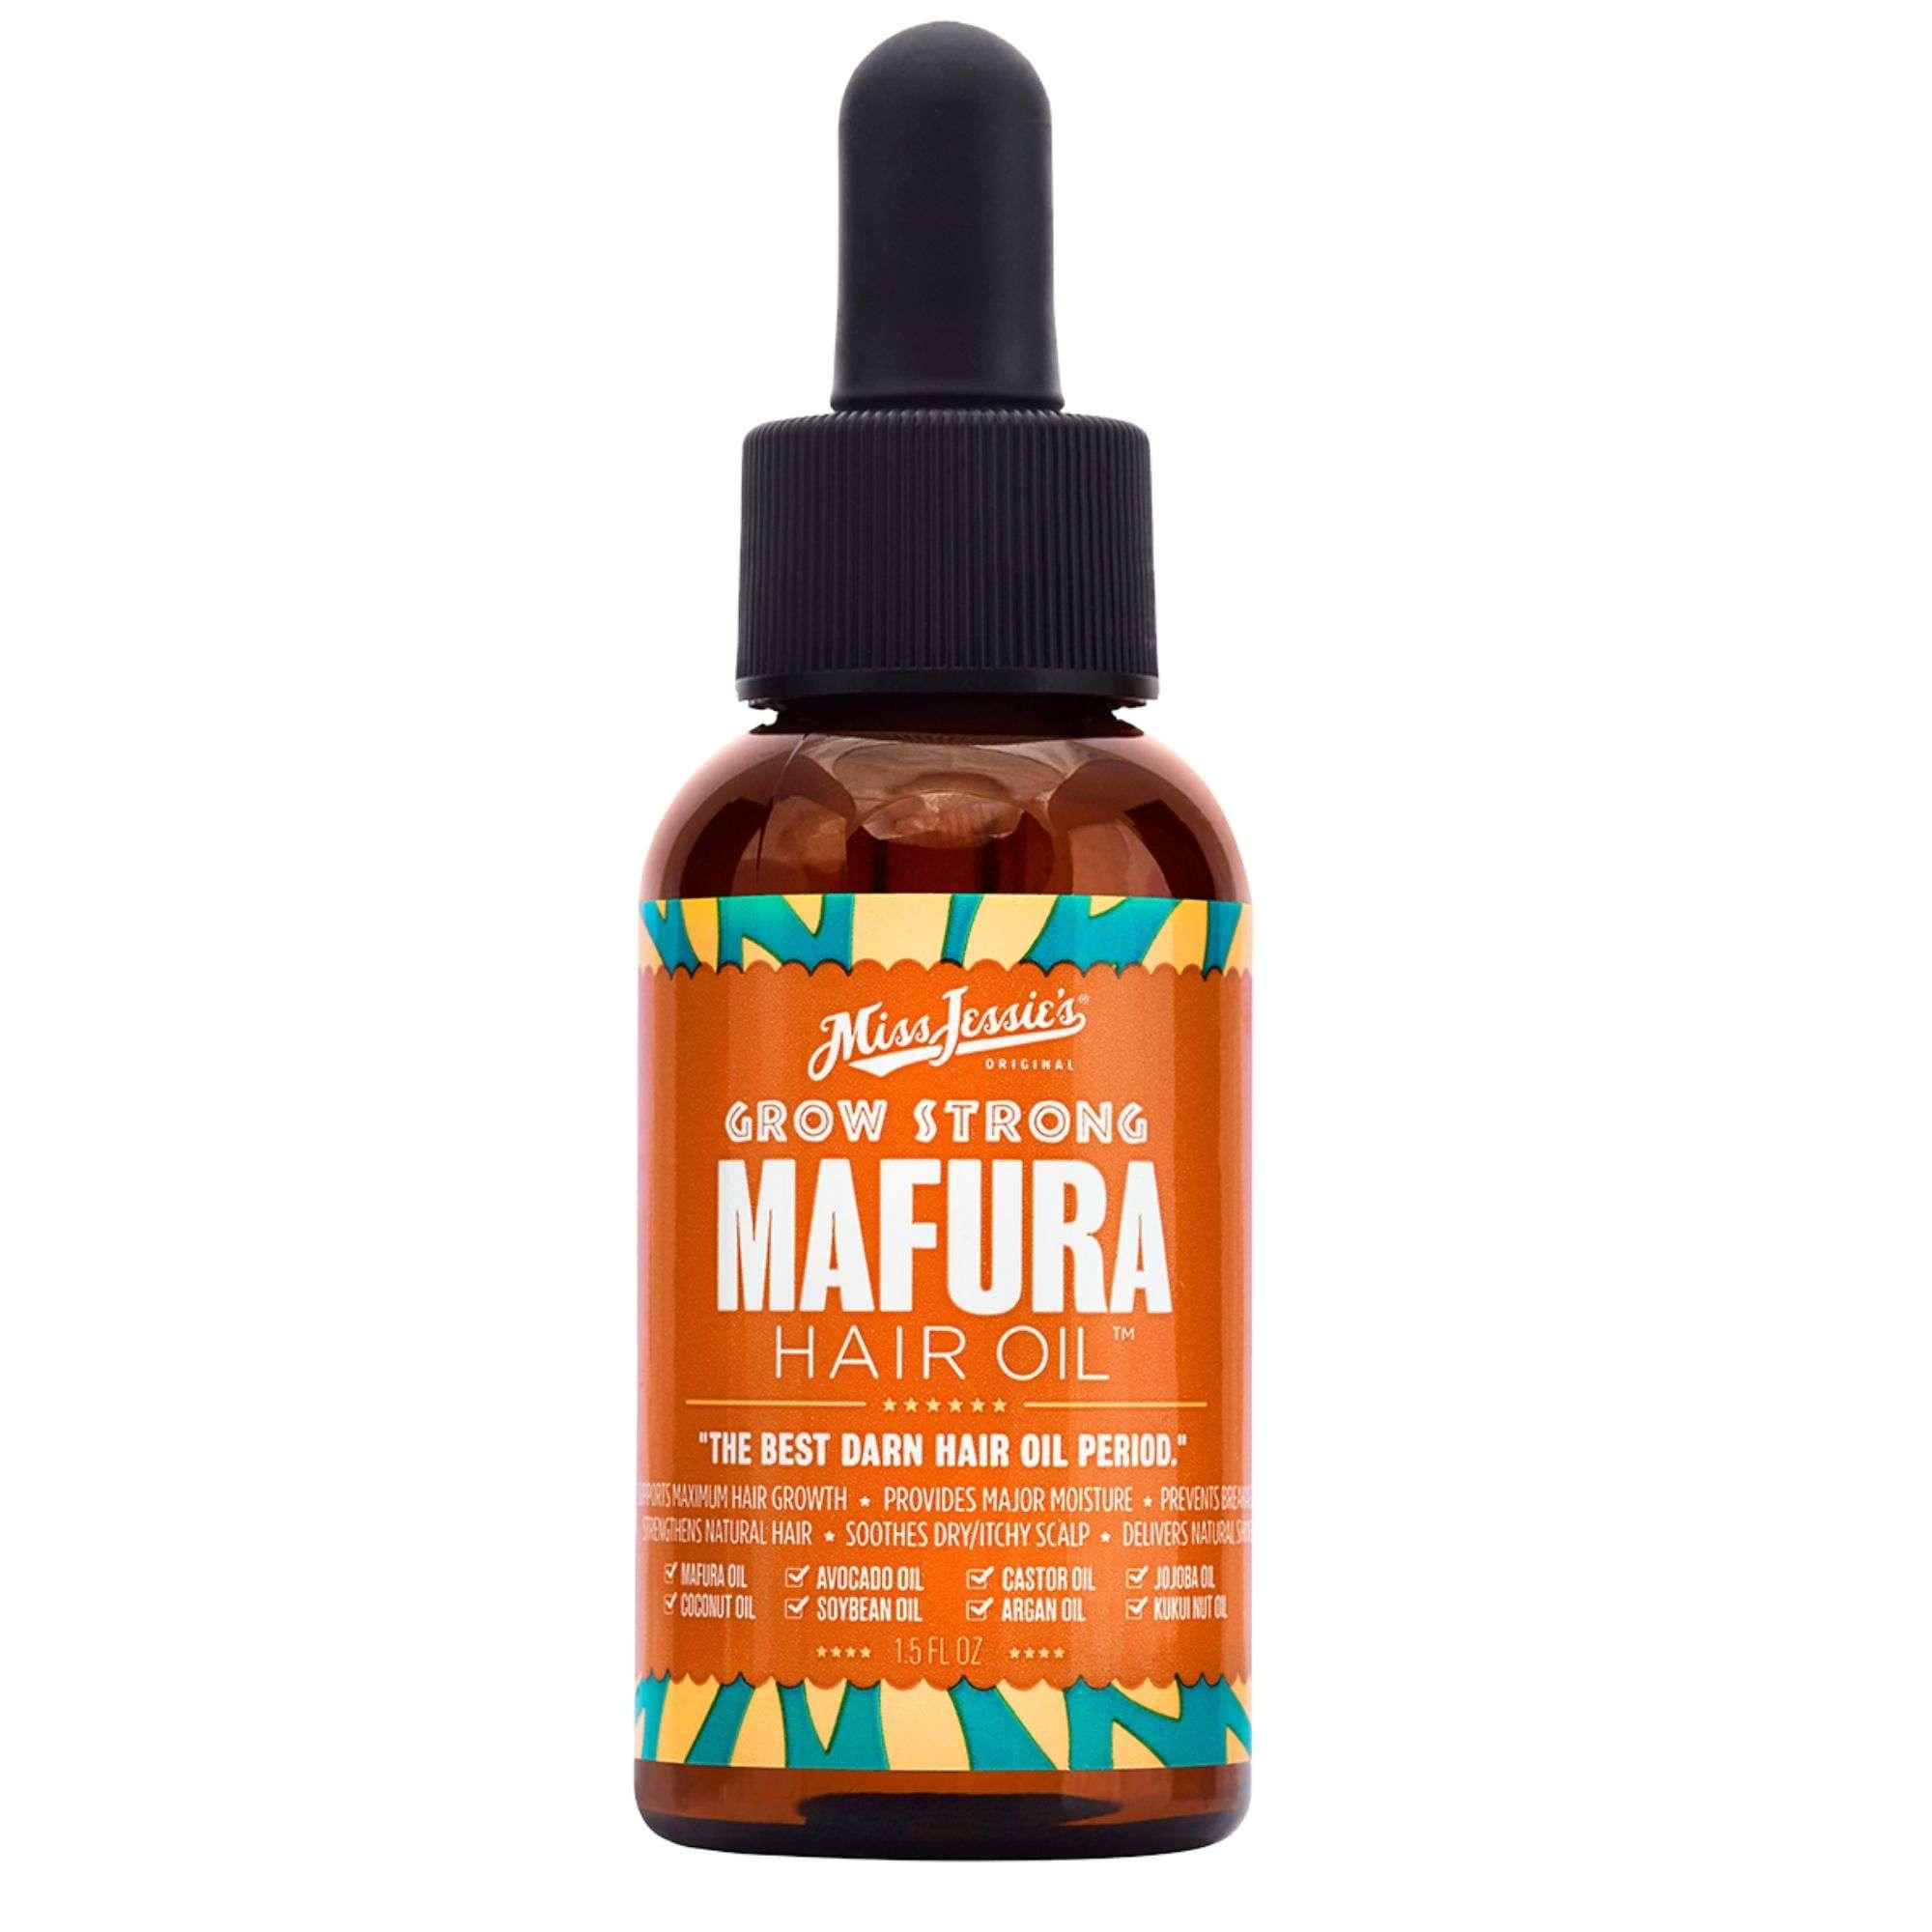 Miss Jessie's Mafura Hair Oil